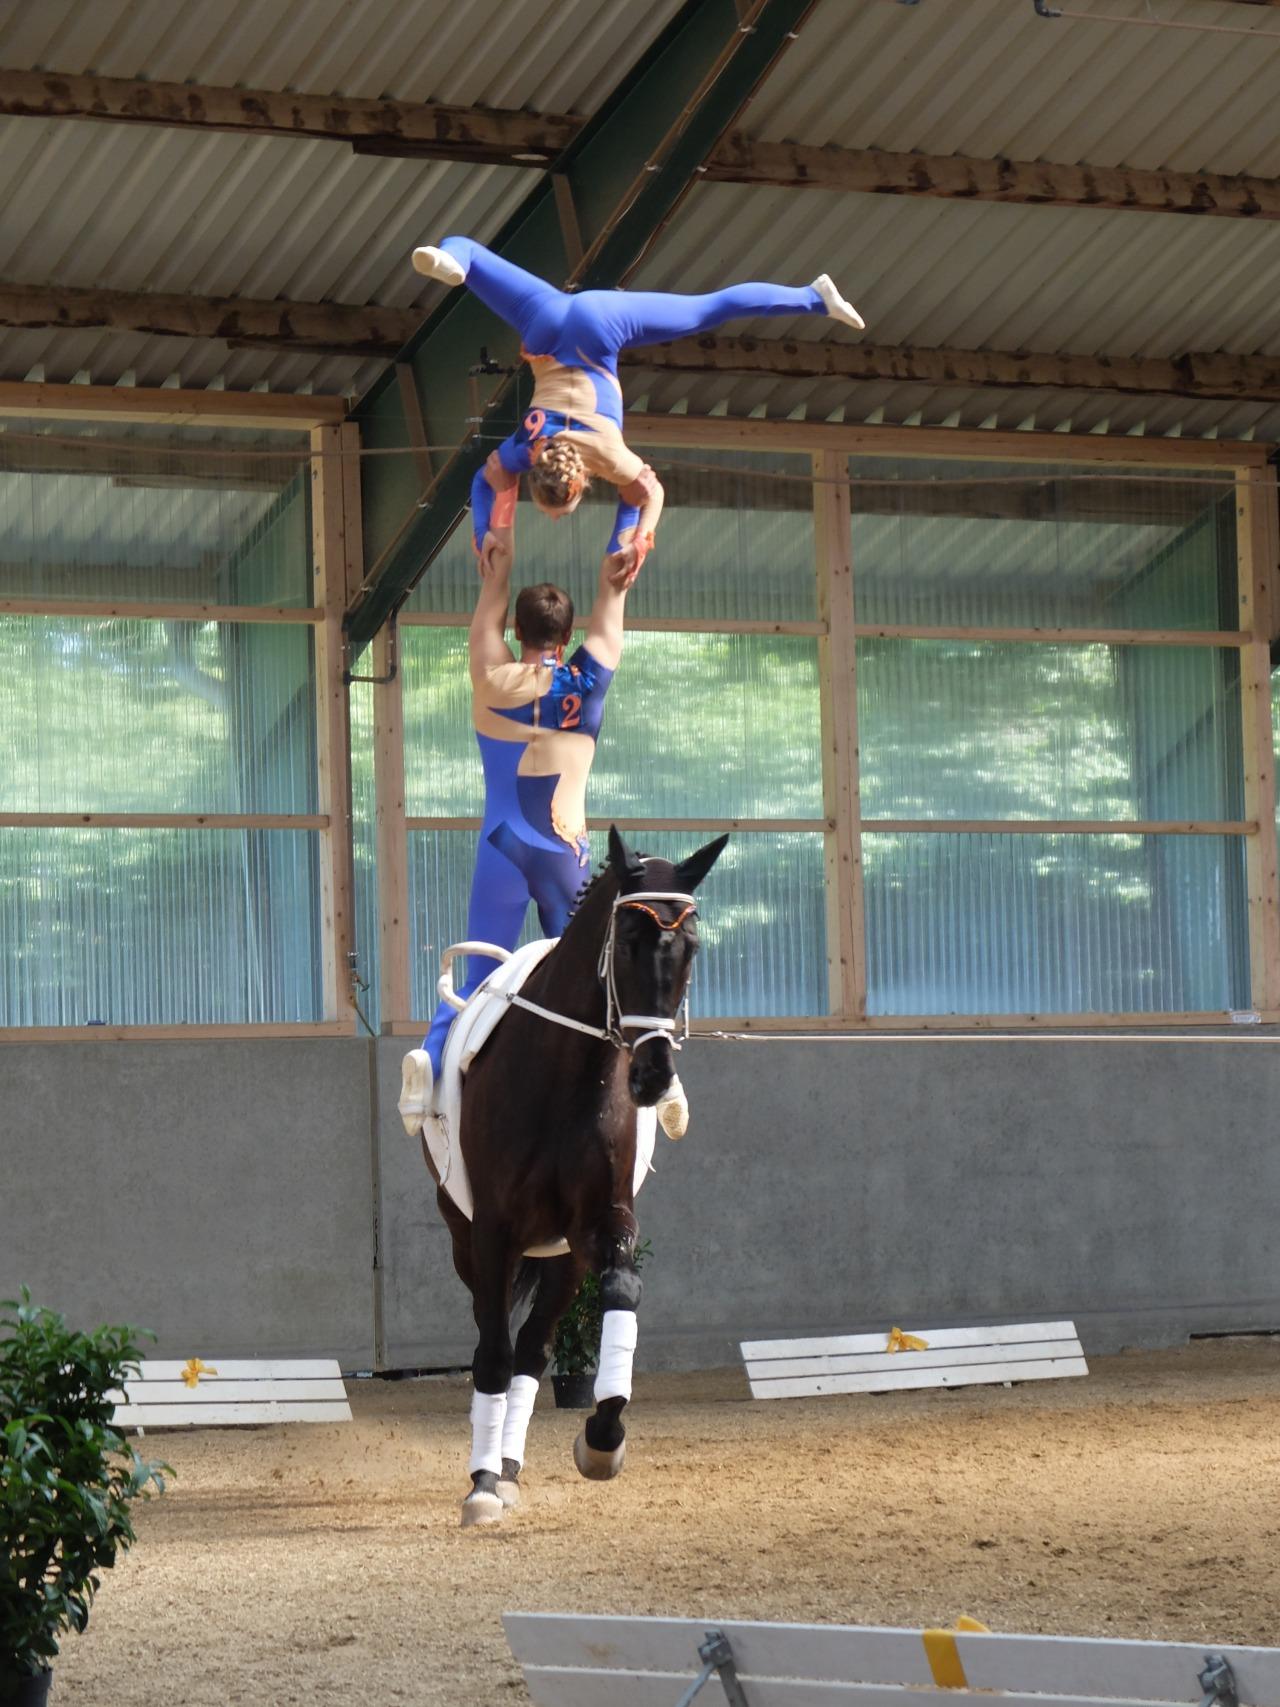 mangia minga - gymnastics on horseback, team RVC Gilching 1